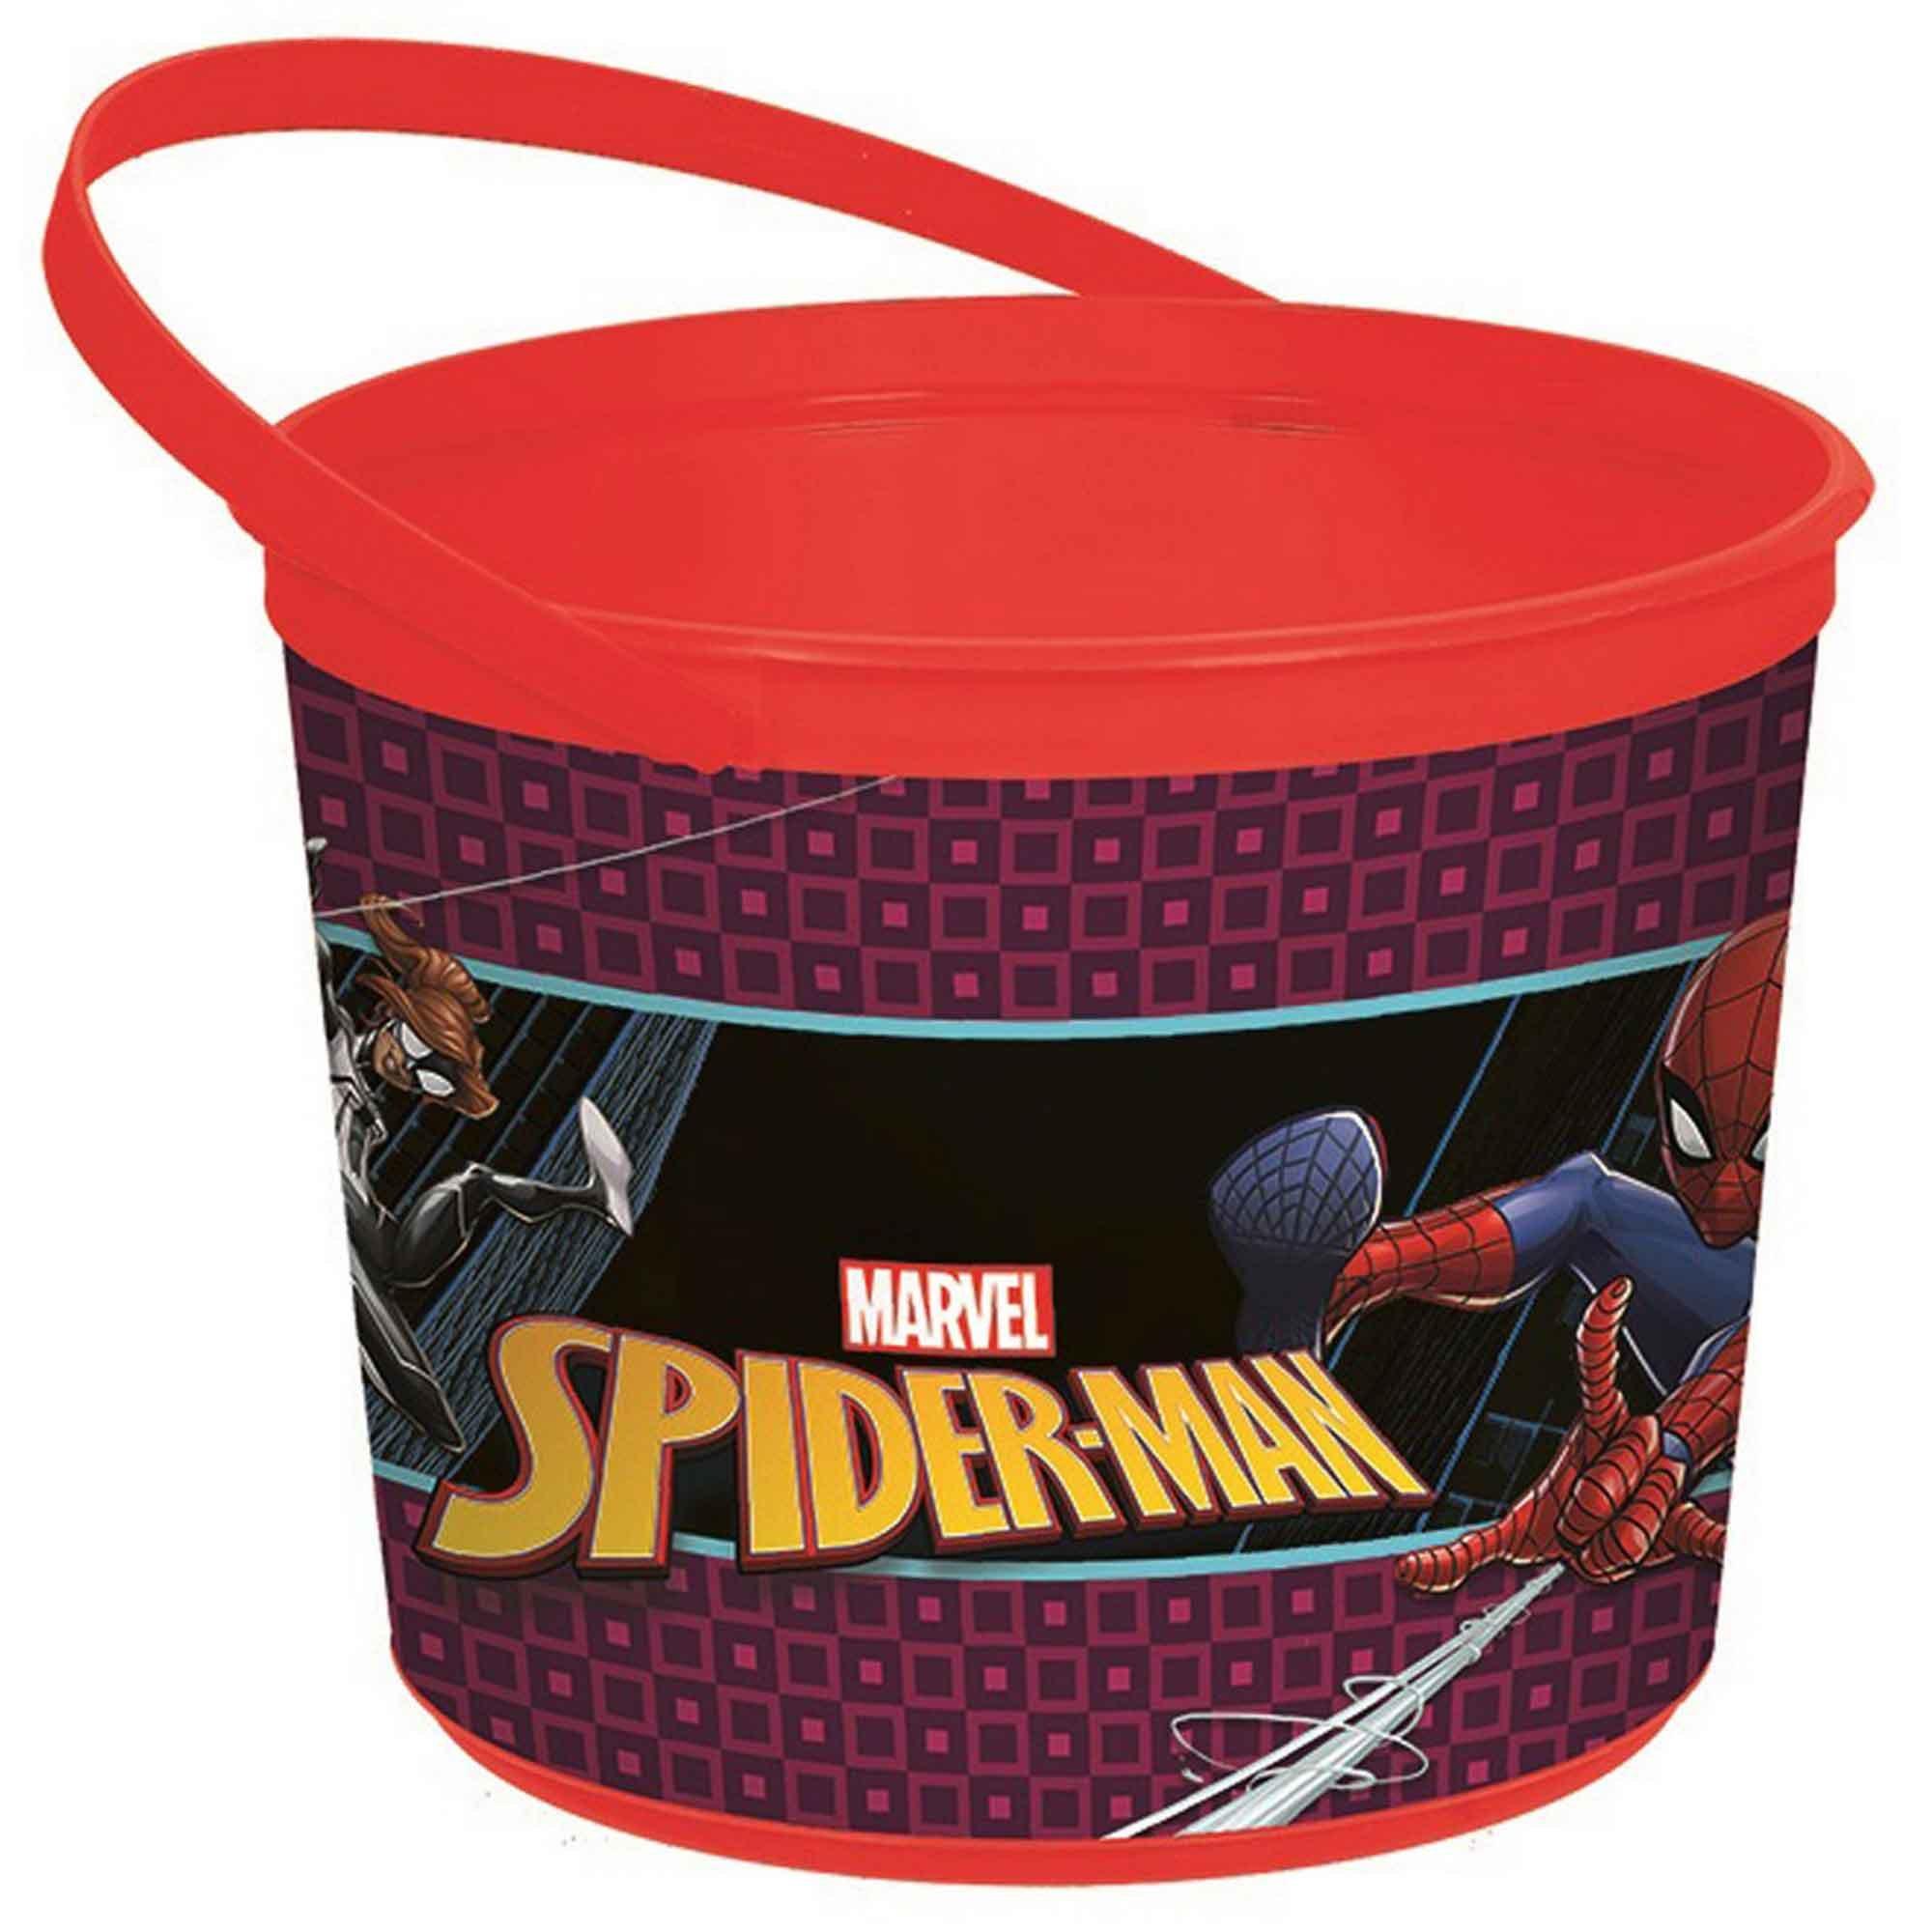 Spider-Man Webbed Wonder Favor Container - Plastic